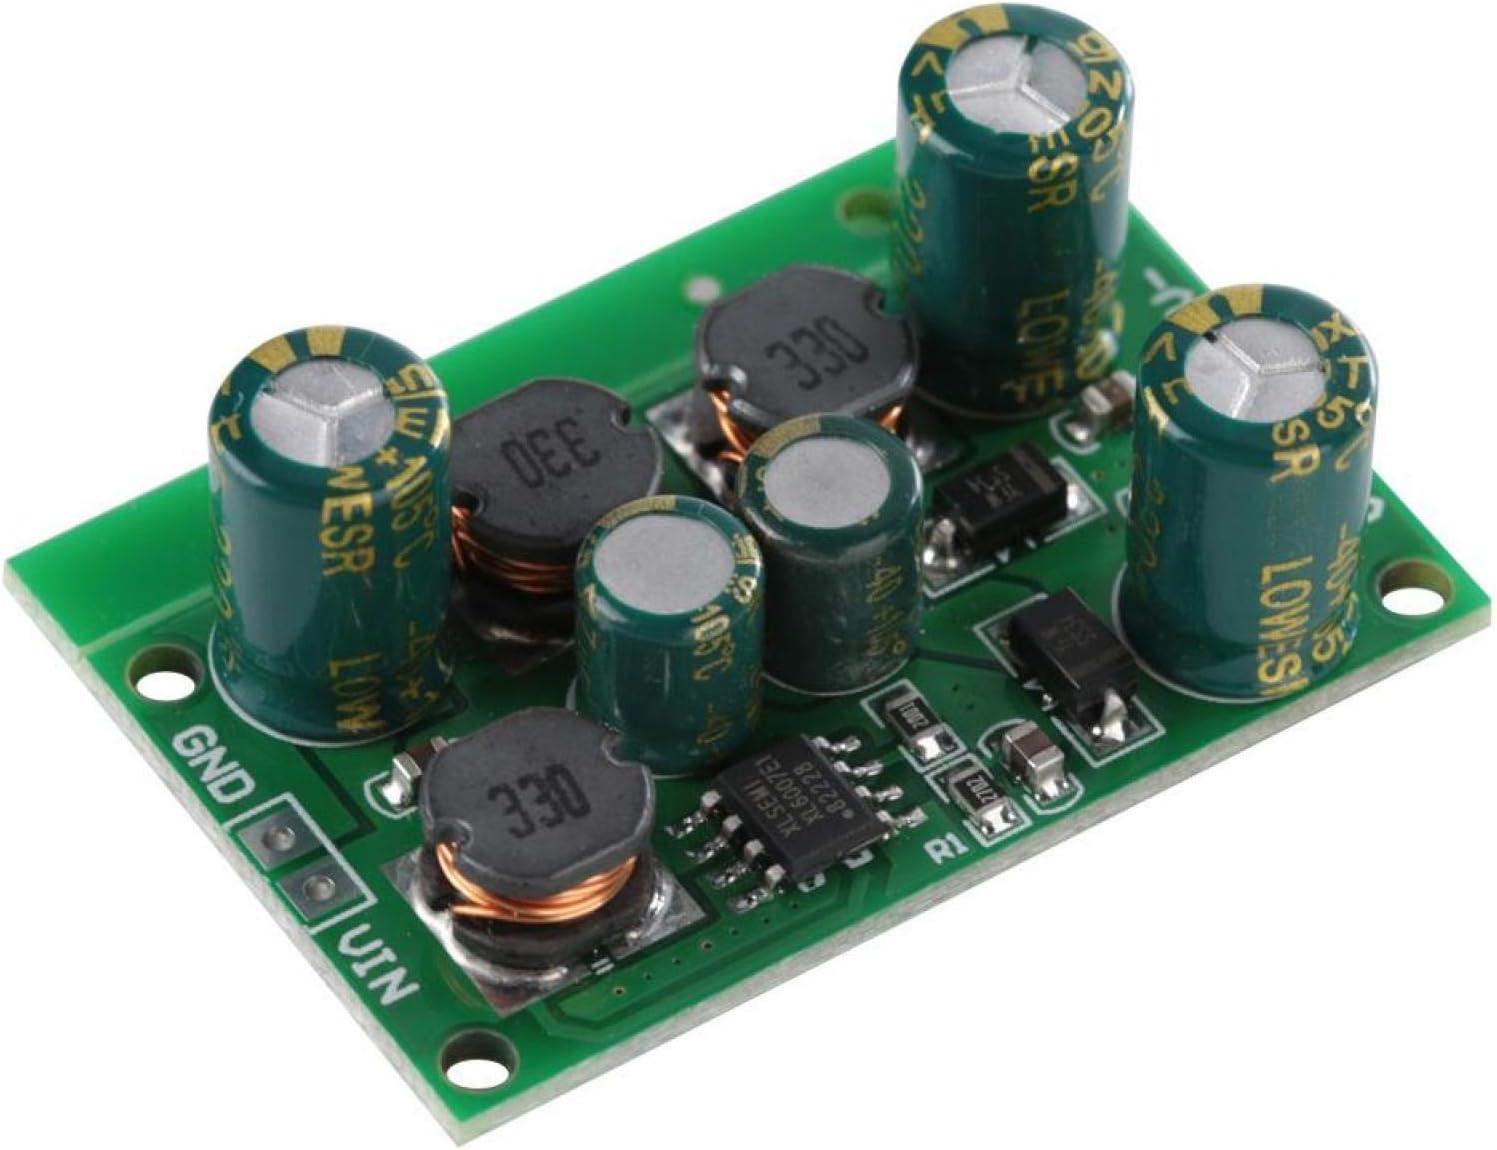 Jeanoko Positive and Negative Voltage Regulator DC-DC Boost Converter Positive and Negative Power Supply Boost Regulator(Output Voltage ±12VDC)